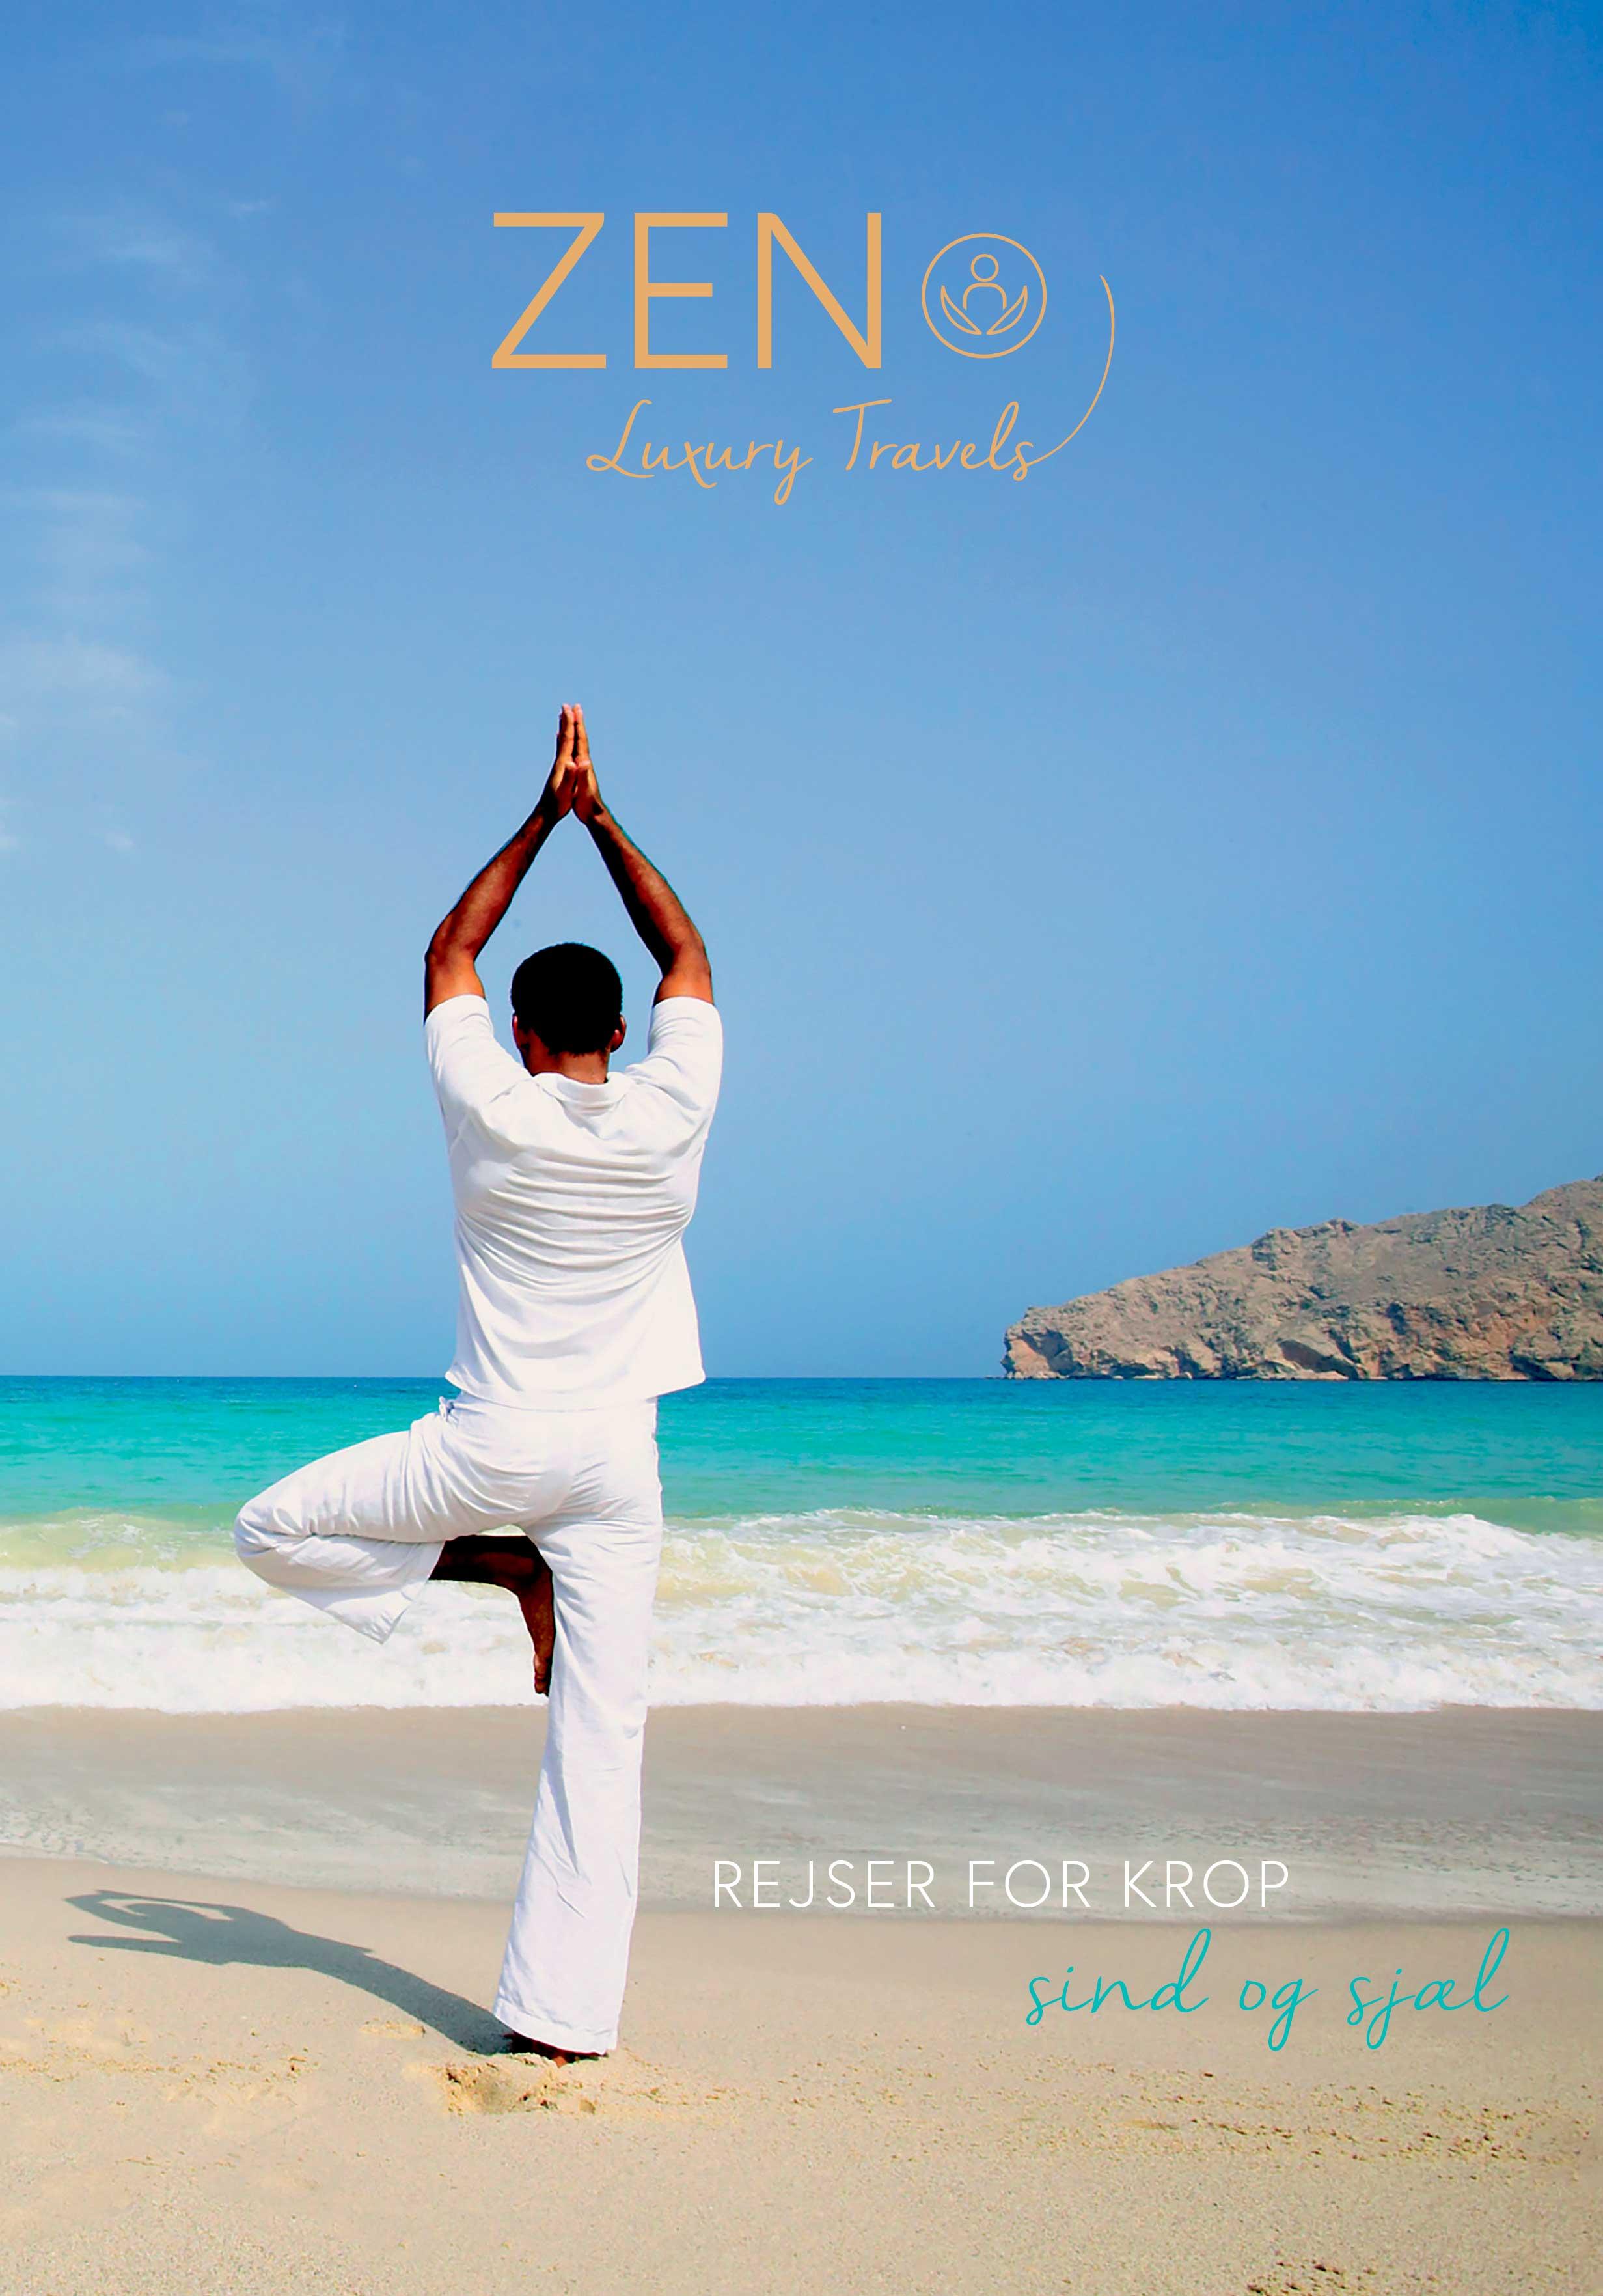 Zen Luxury Travels rejsekatalog